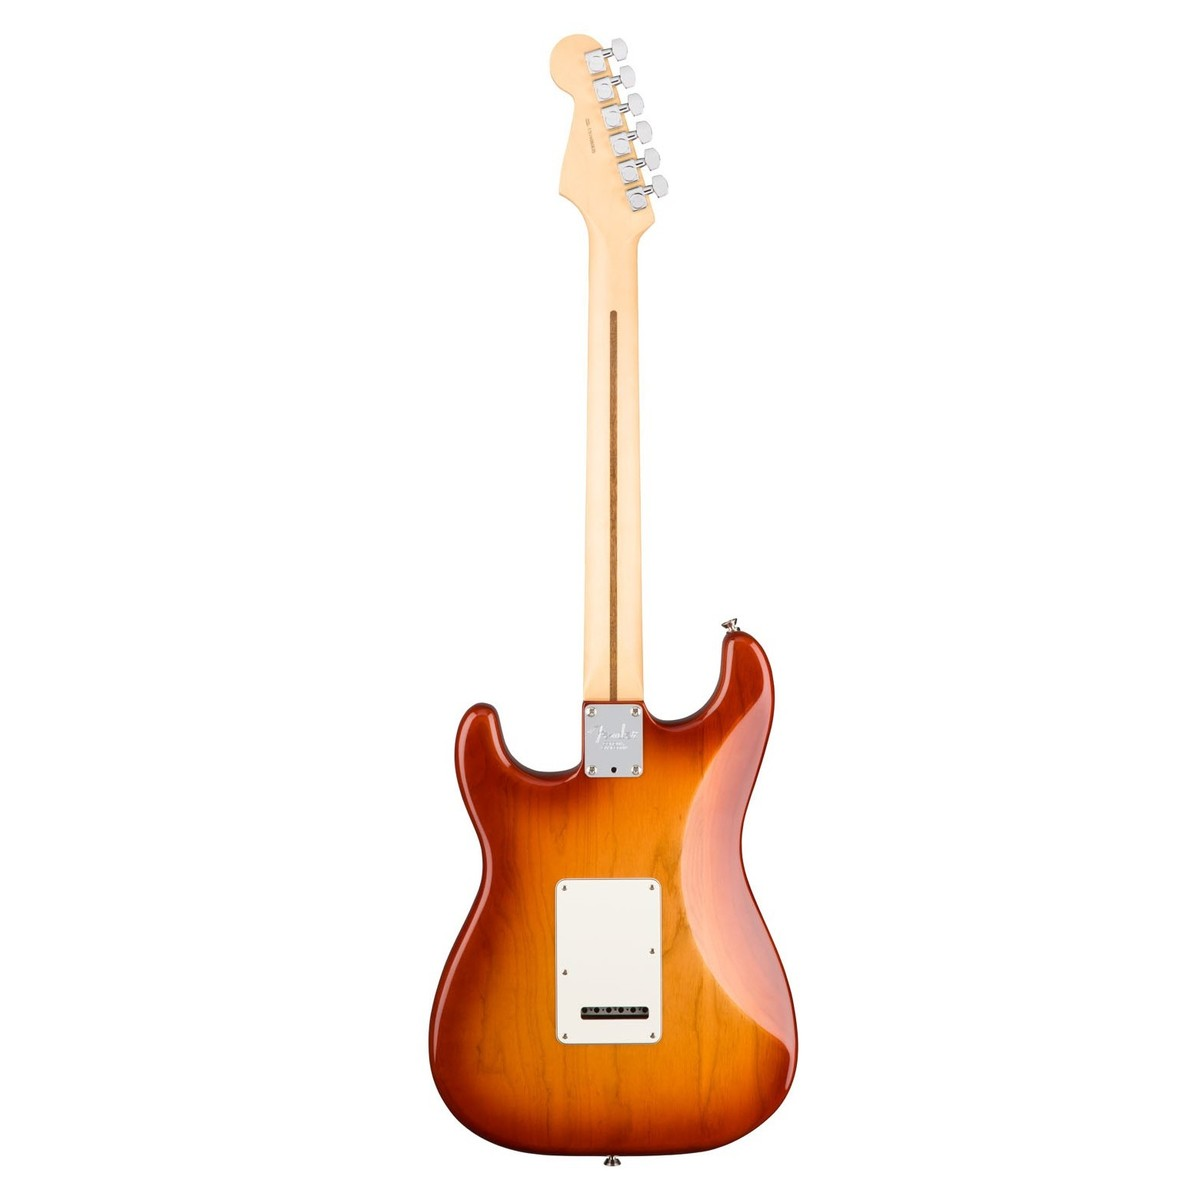 Fender American Professional Stratocaster Rw Sienna